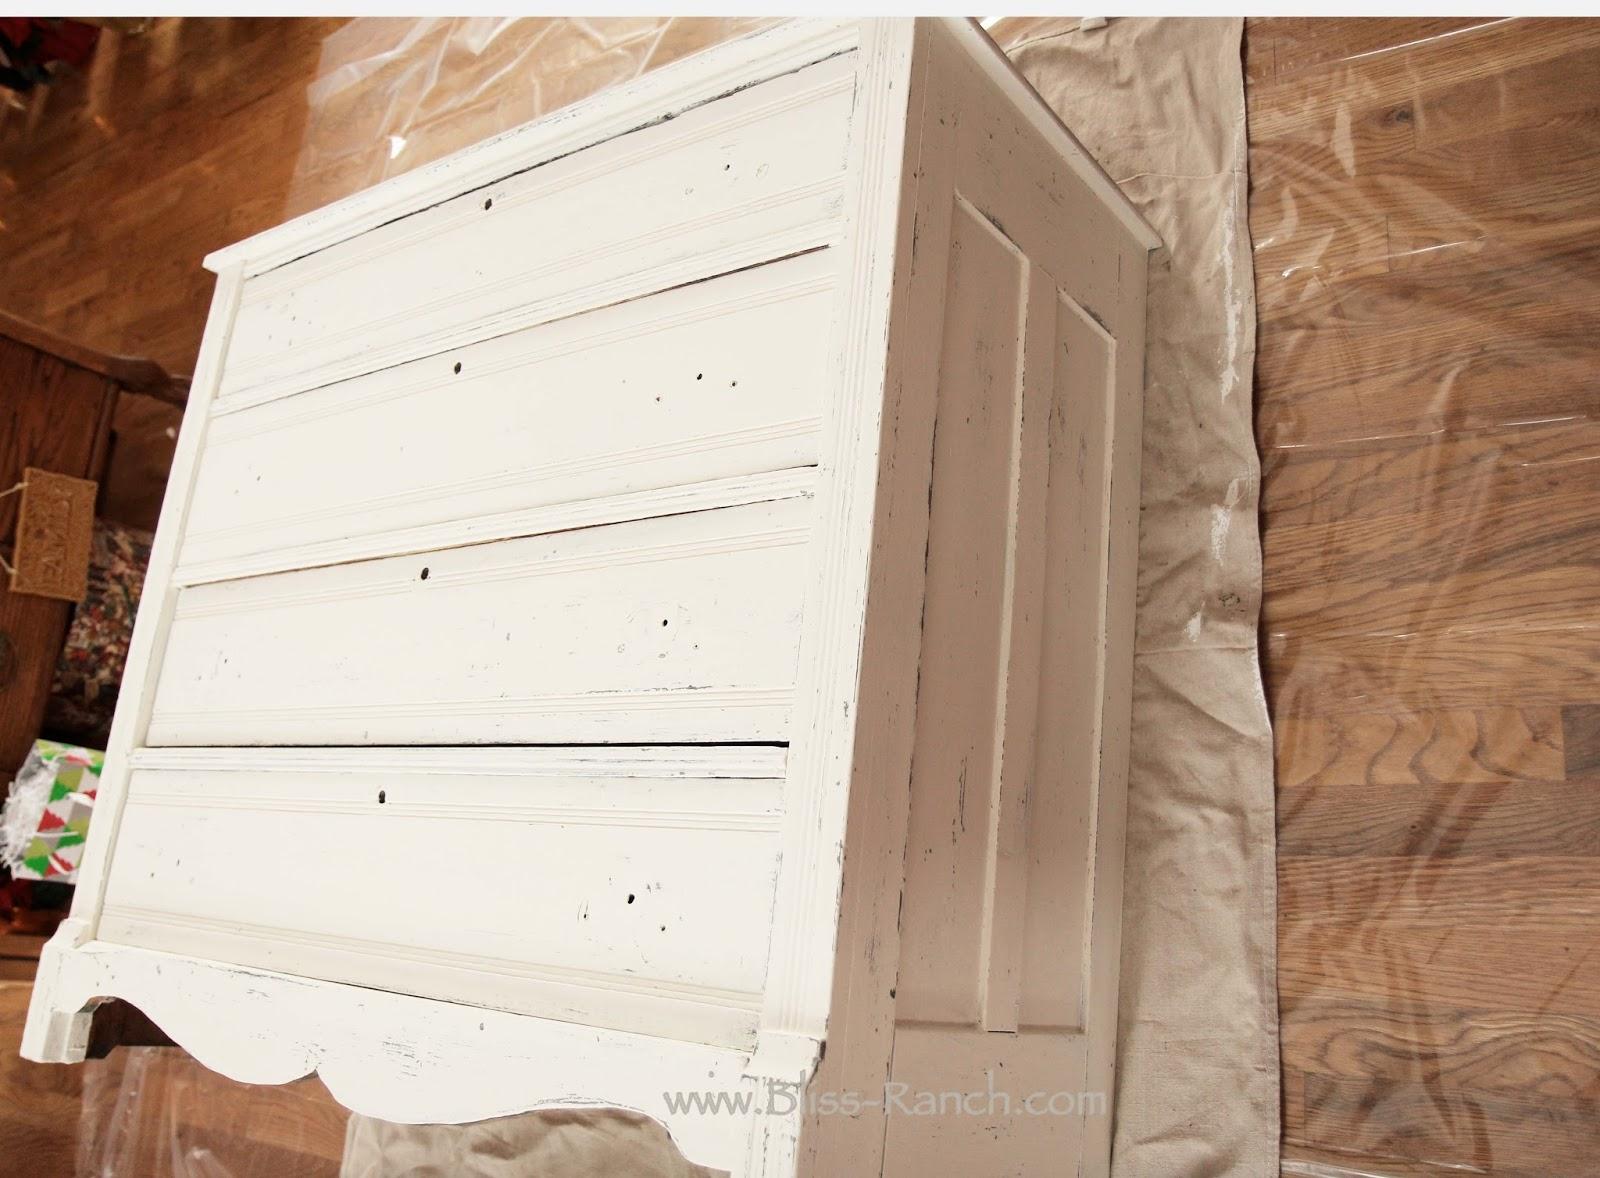 Old Dresser Bliss-Ranch.com